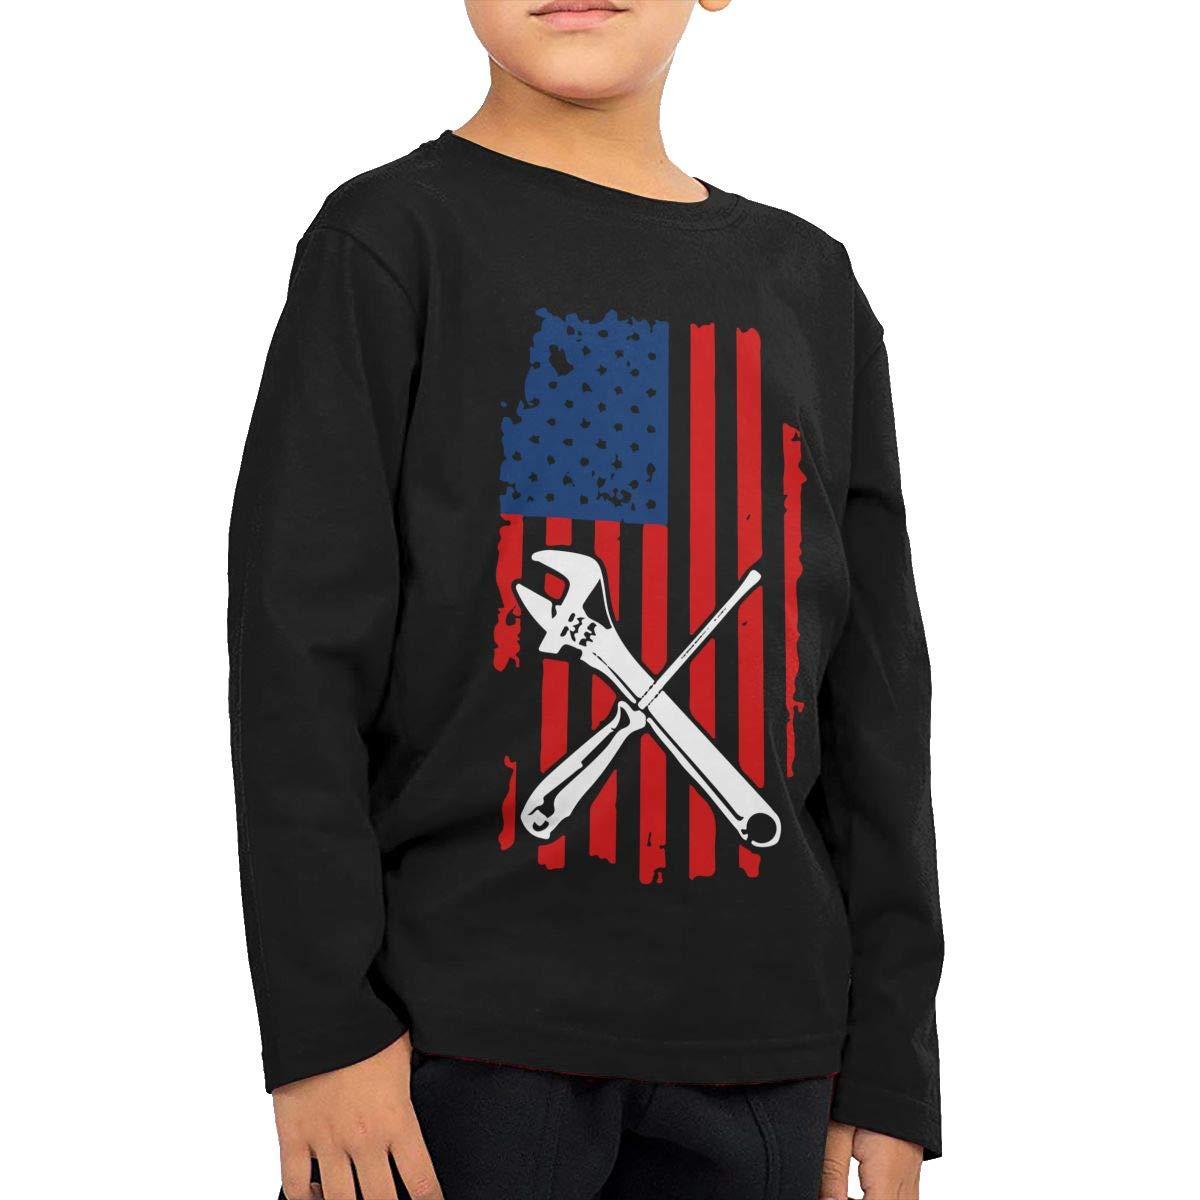 Mechanic Patriotic American Flag Novelty Toddler Kid Baby Boys Girls Long Sleeve T Shirts Top/&Tee